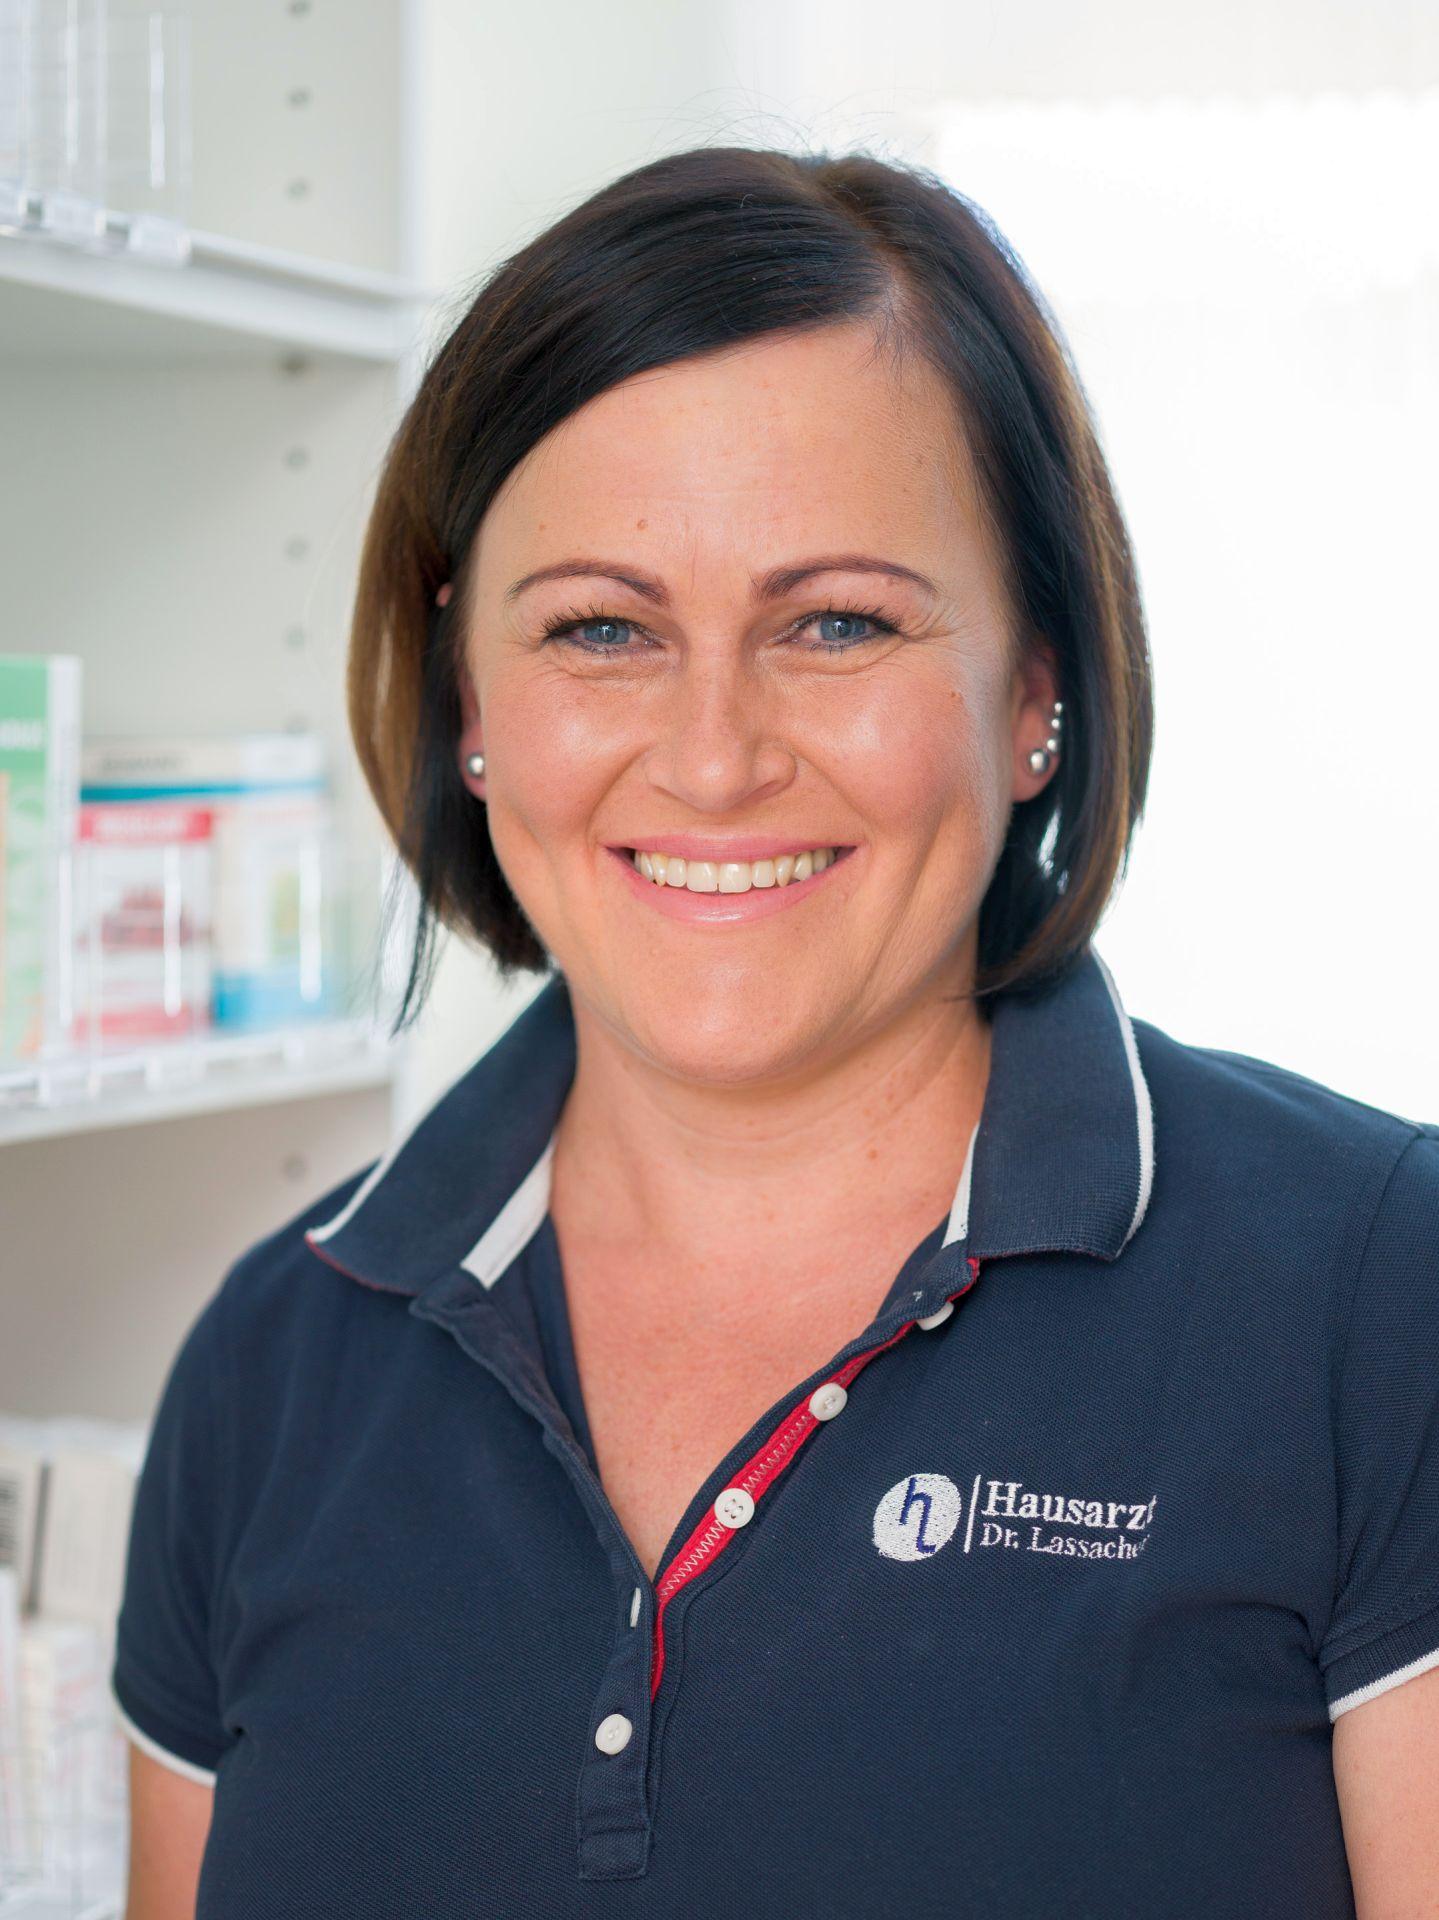 Katrin Lerchner - Hausarzt Dr. Lassacher